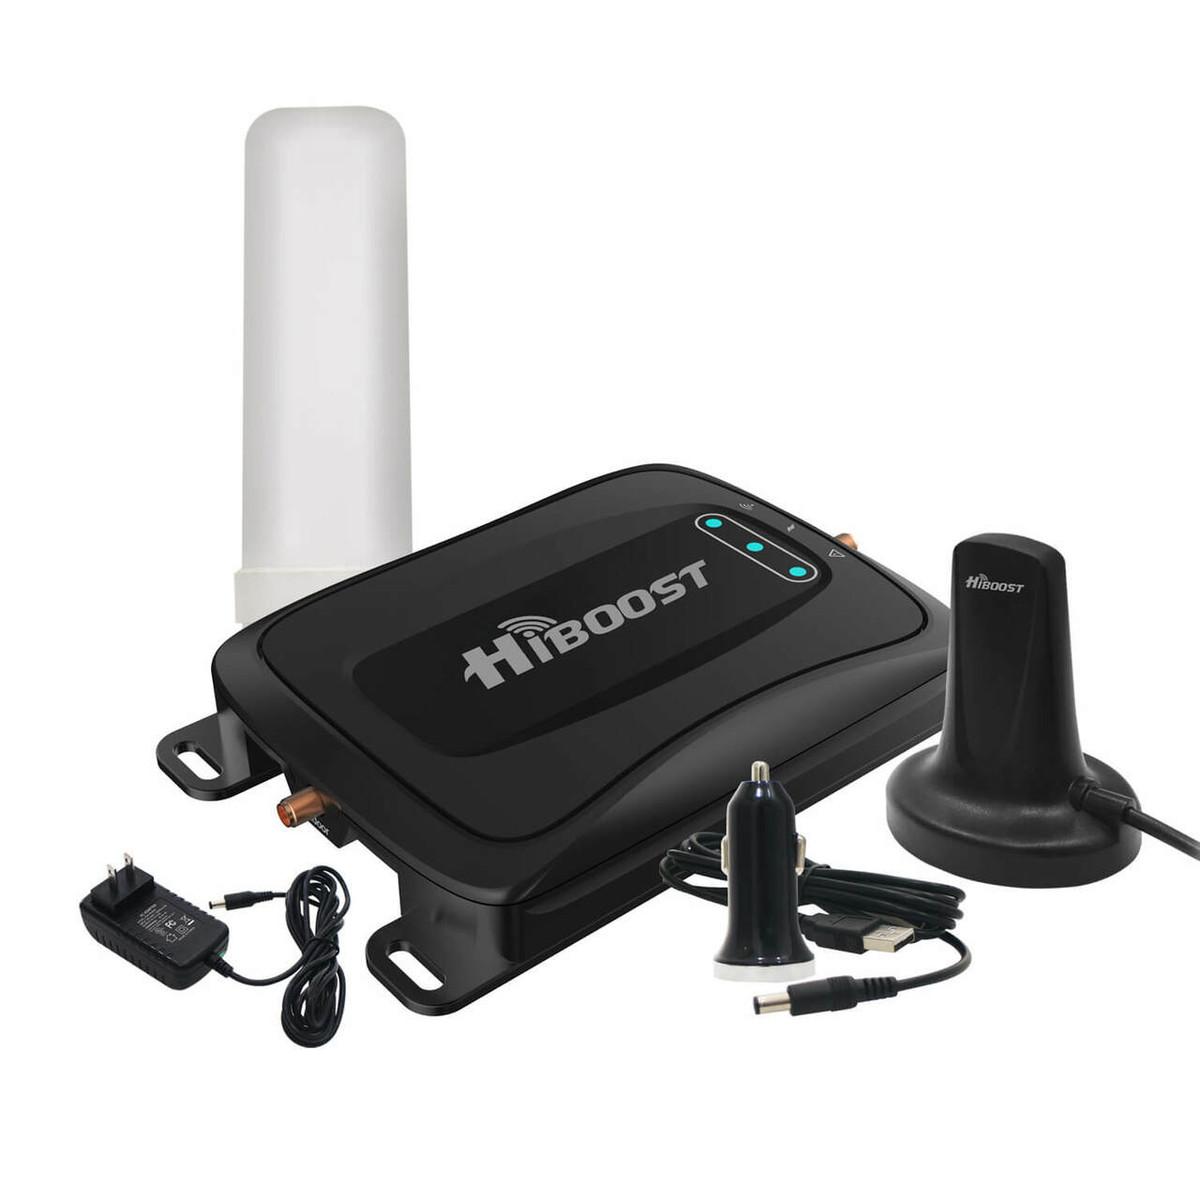 HiBoost HiBoost Travel 4G 2.0 RV LTE Car Cell Phone Signal Booster Kit or C27G-5S-BTW-RV